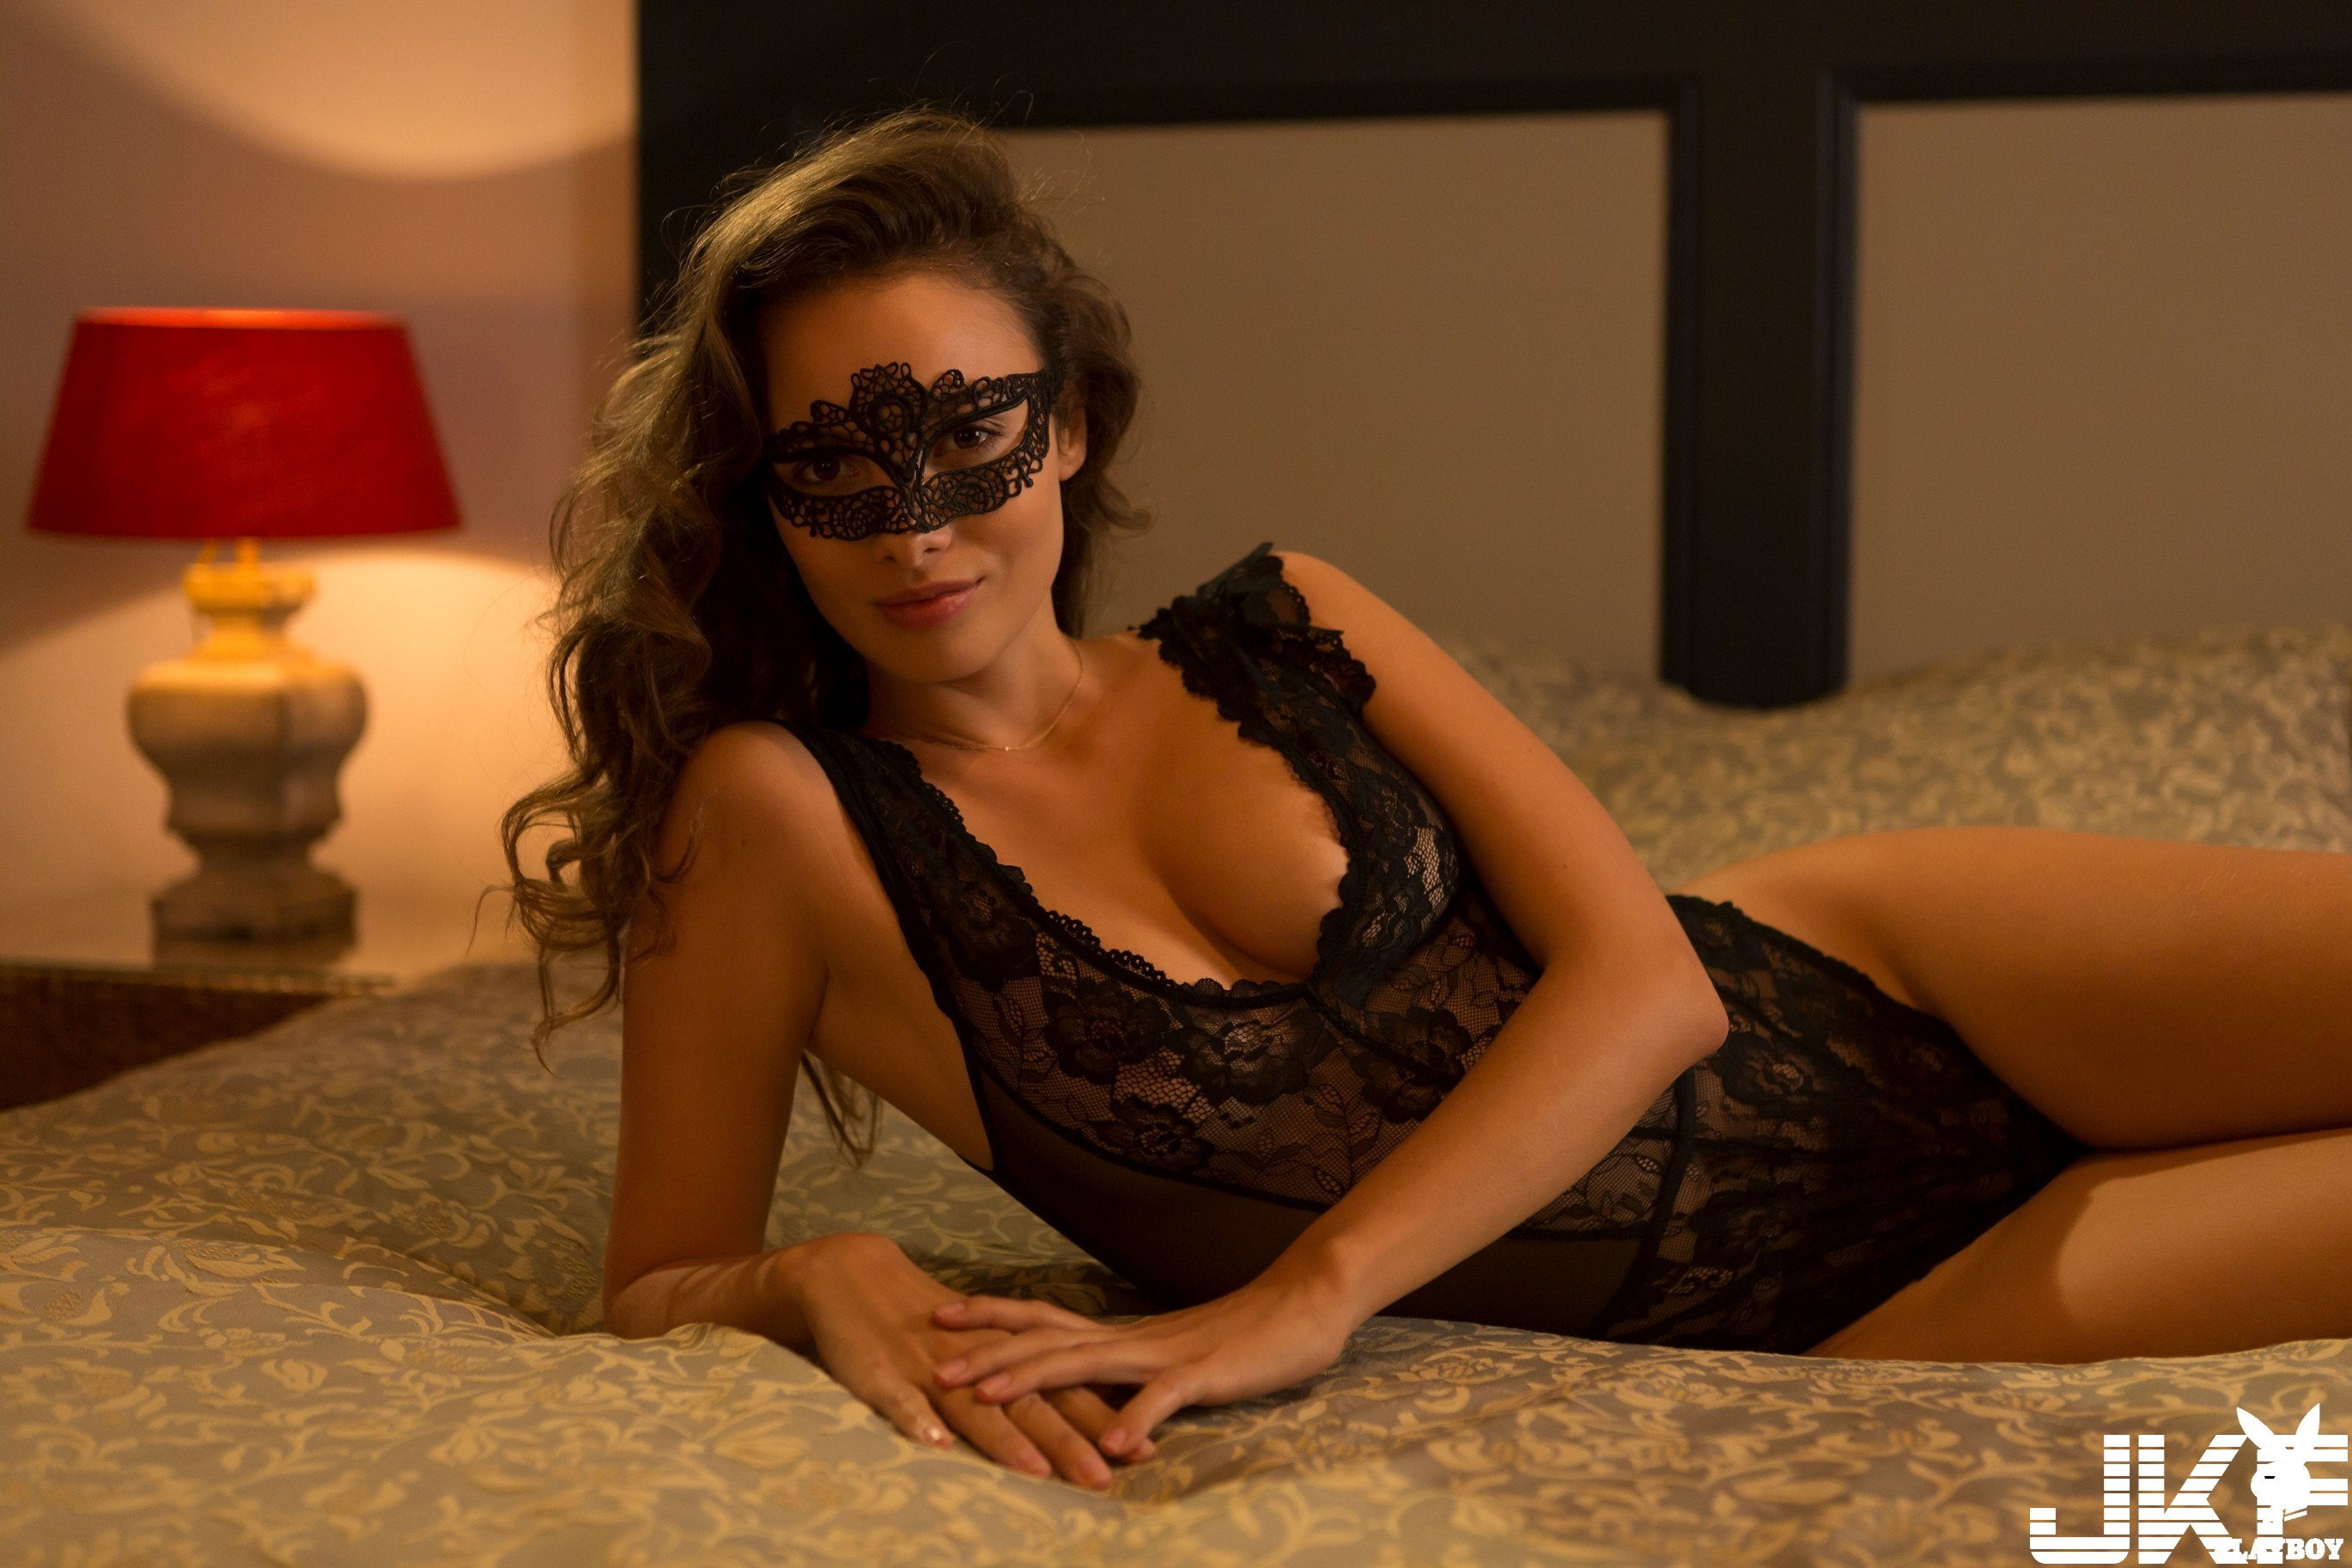 【Playboy系列】2019-01-02 Calypso Muse in Evening Desires【40P】 - 貼圖 - 歐美寫真 -